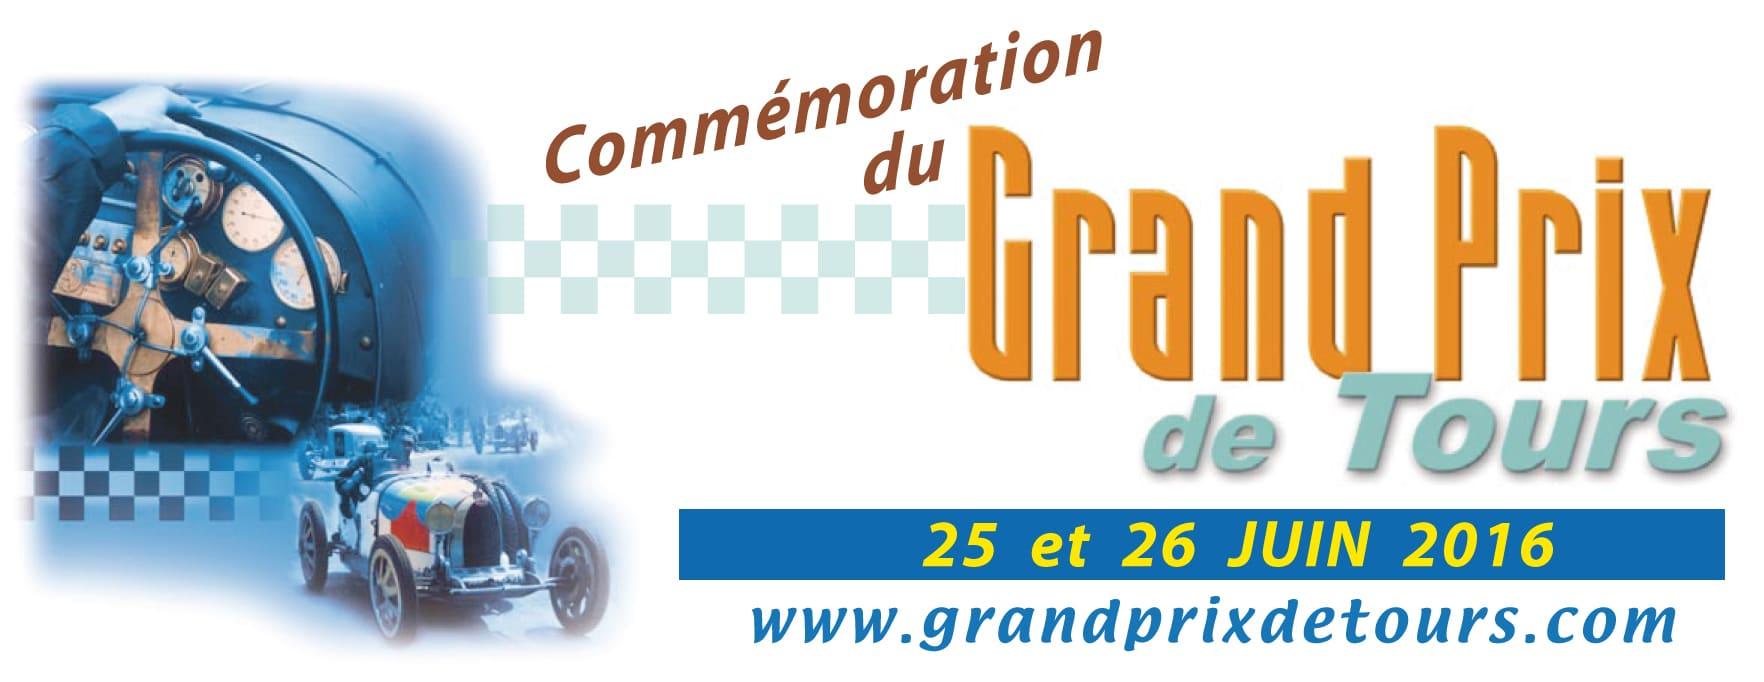 GRAND PRIX DE TOURS 2016